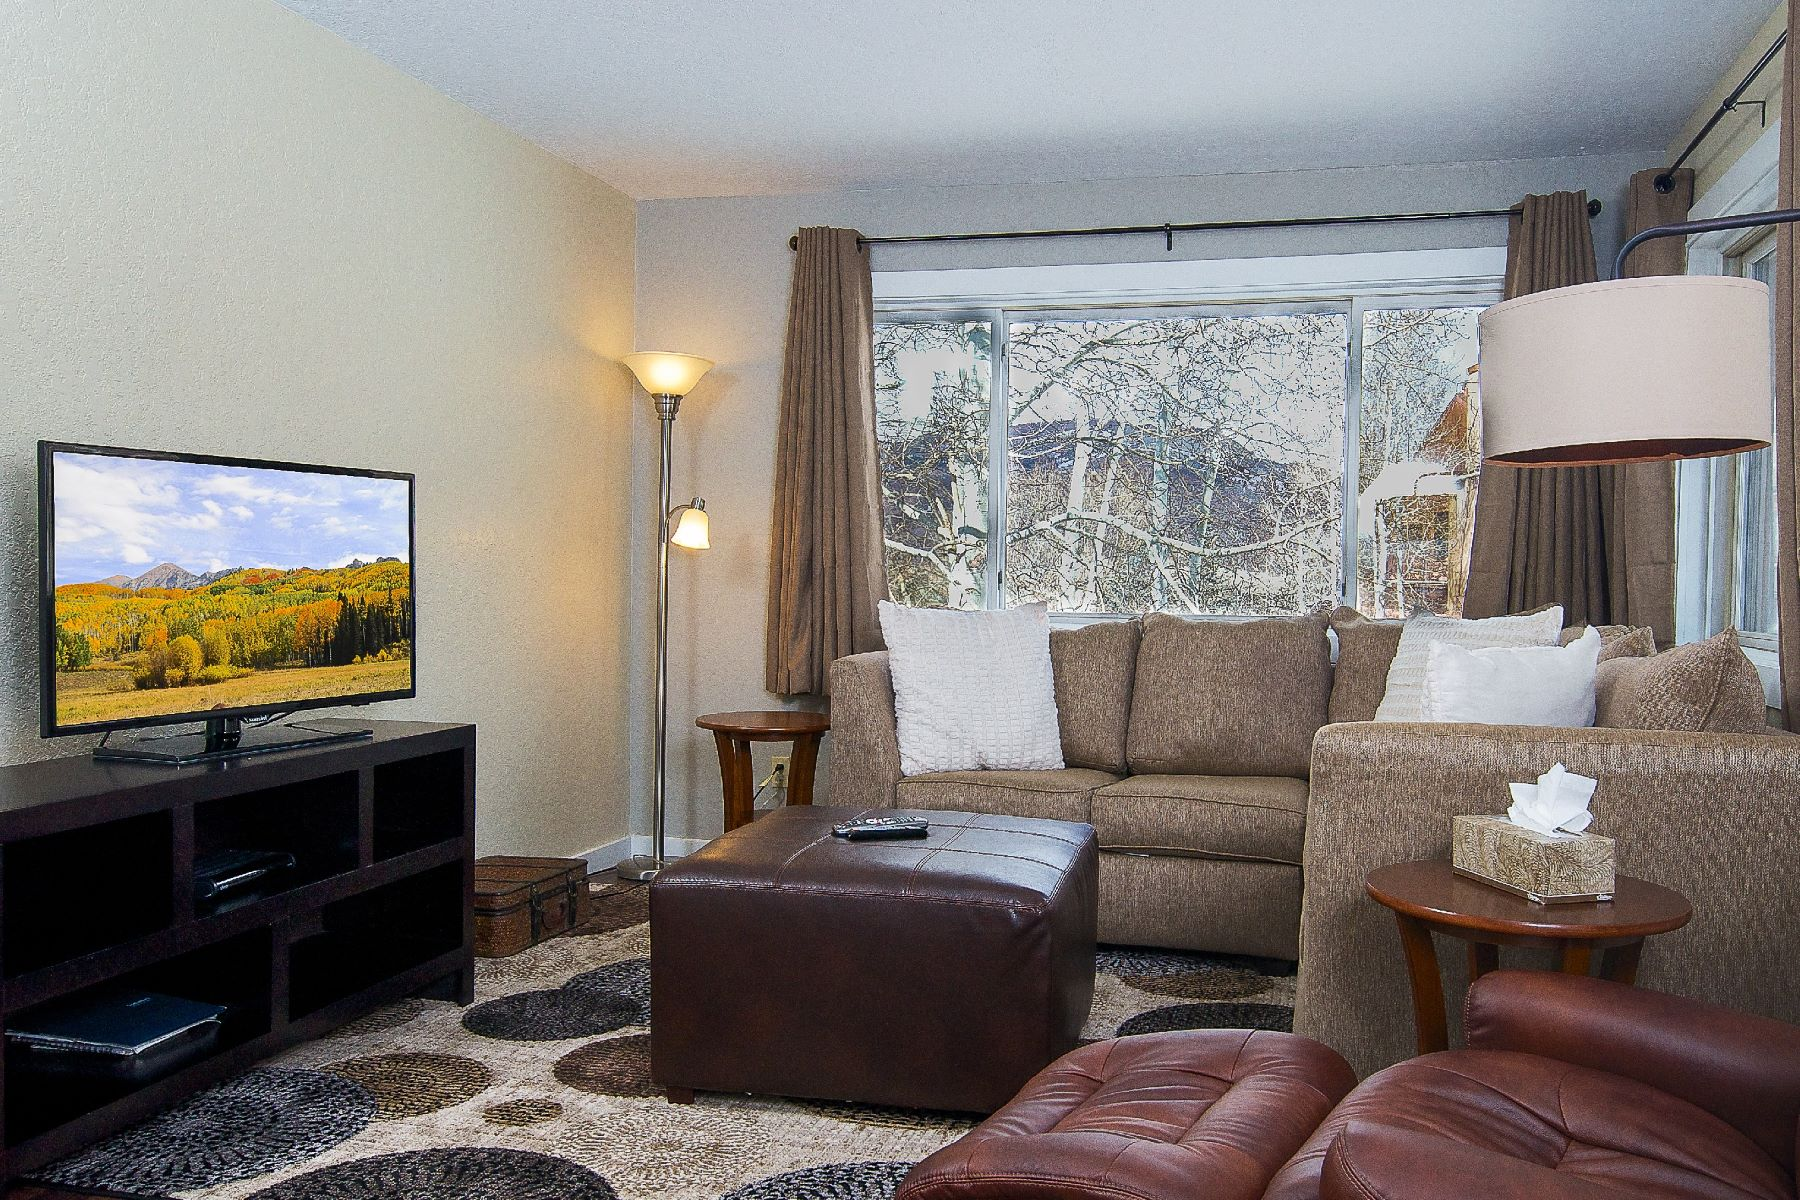 Country Club Villa #1212 294 Snowmass Club Circle 1212 Snowmass Village, Colorado 81615 United States